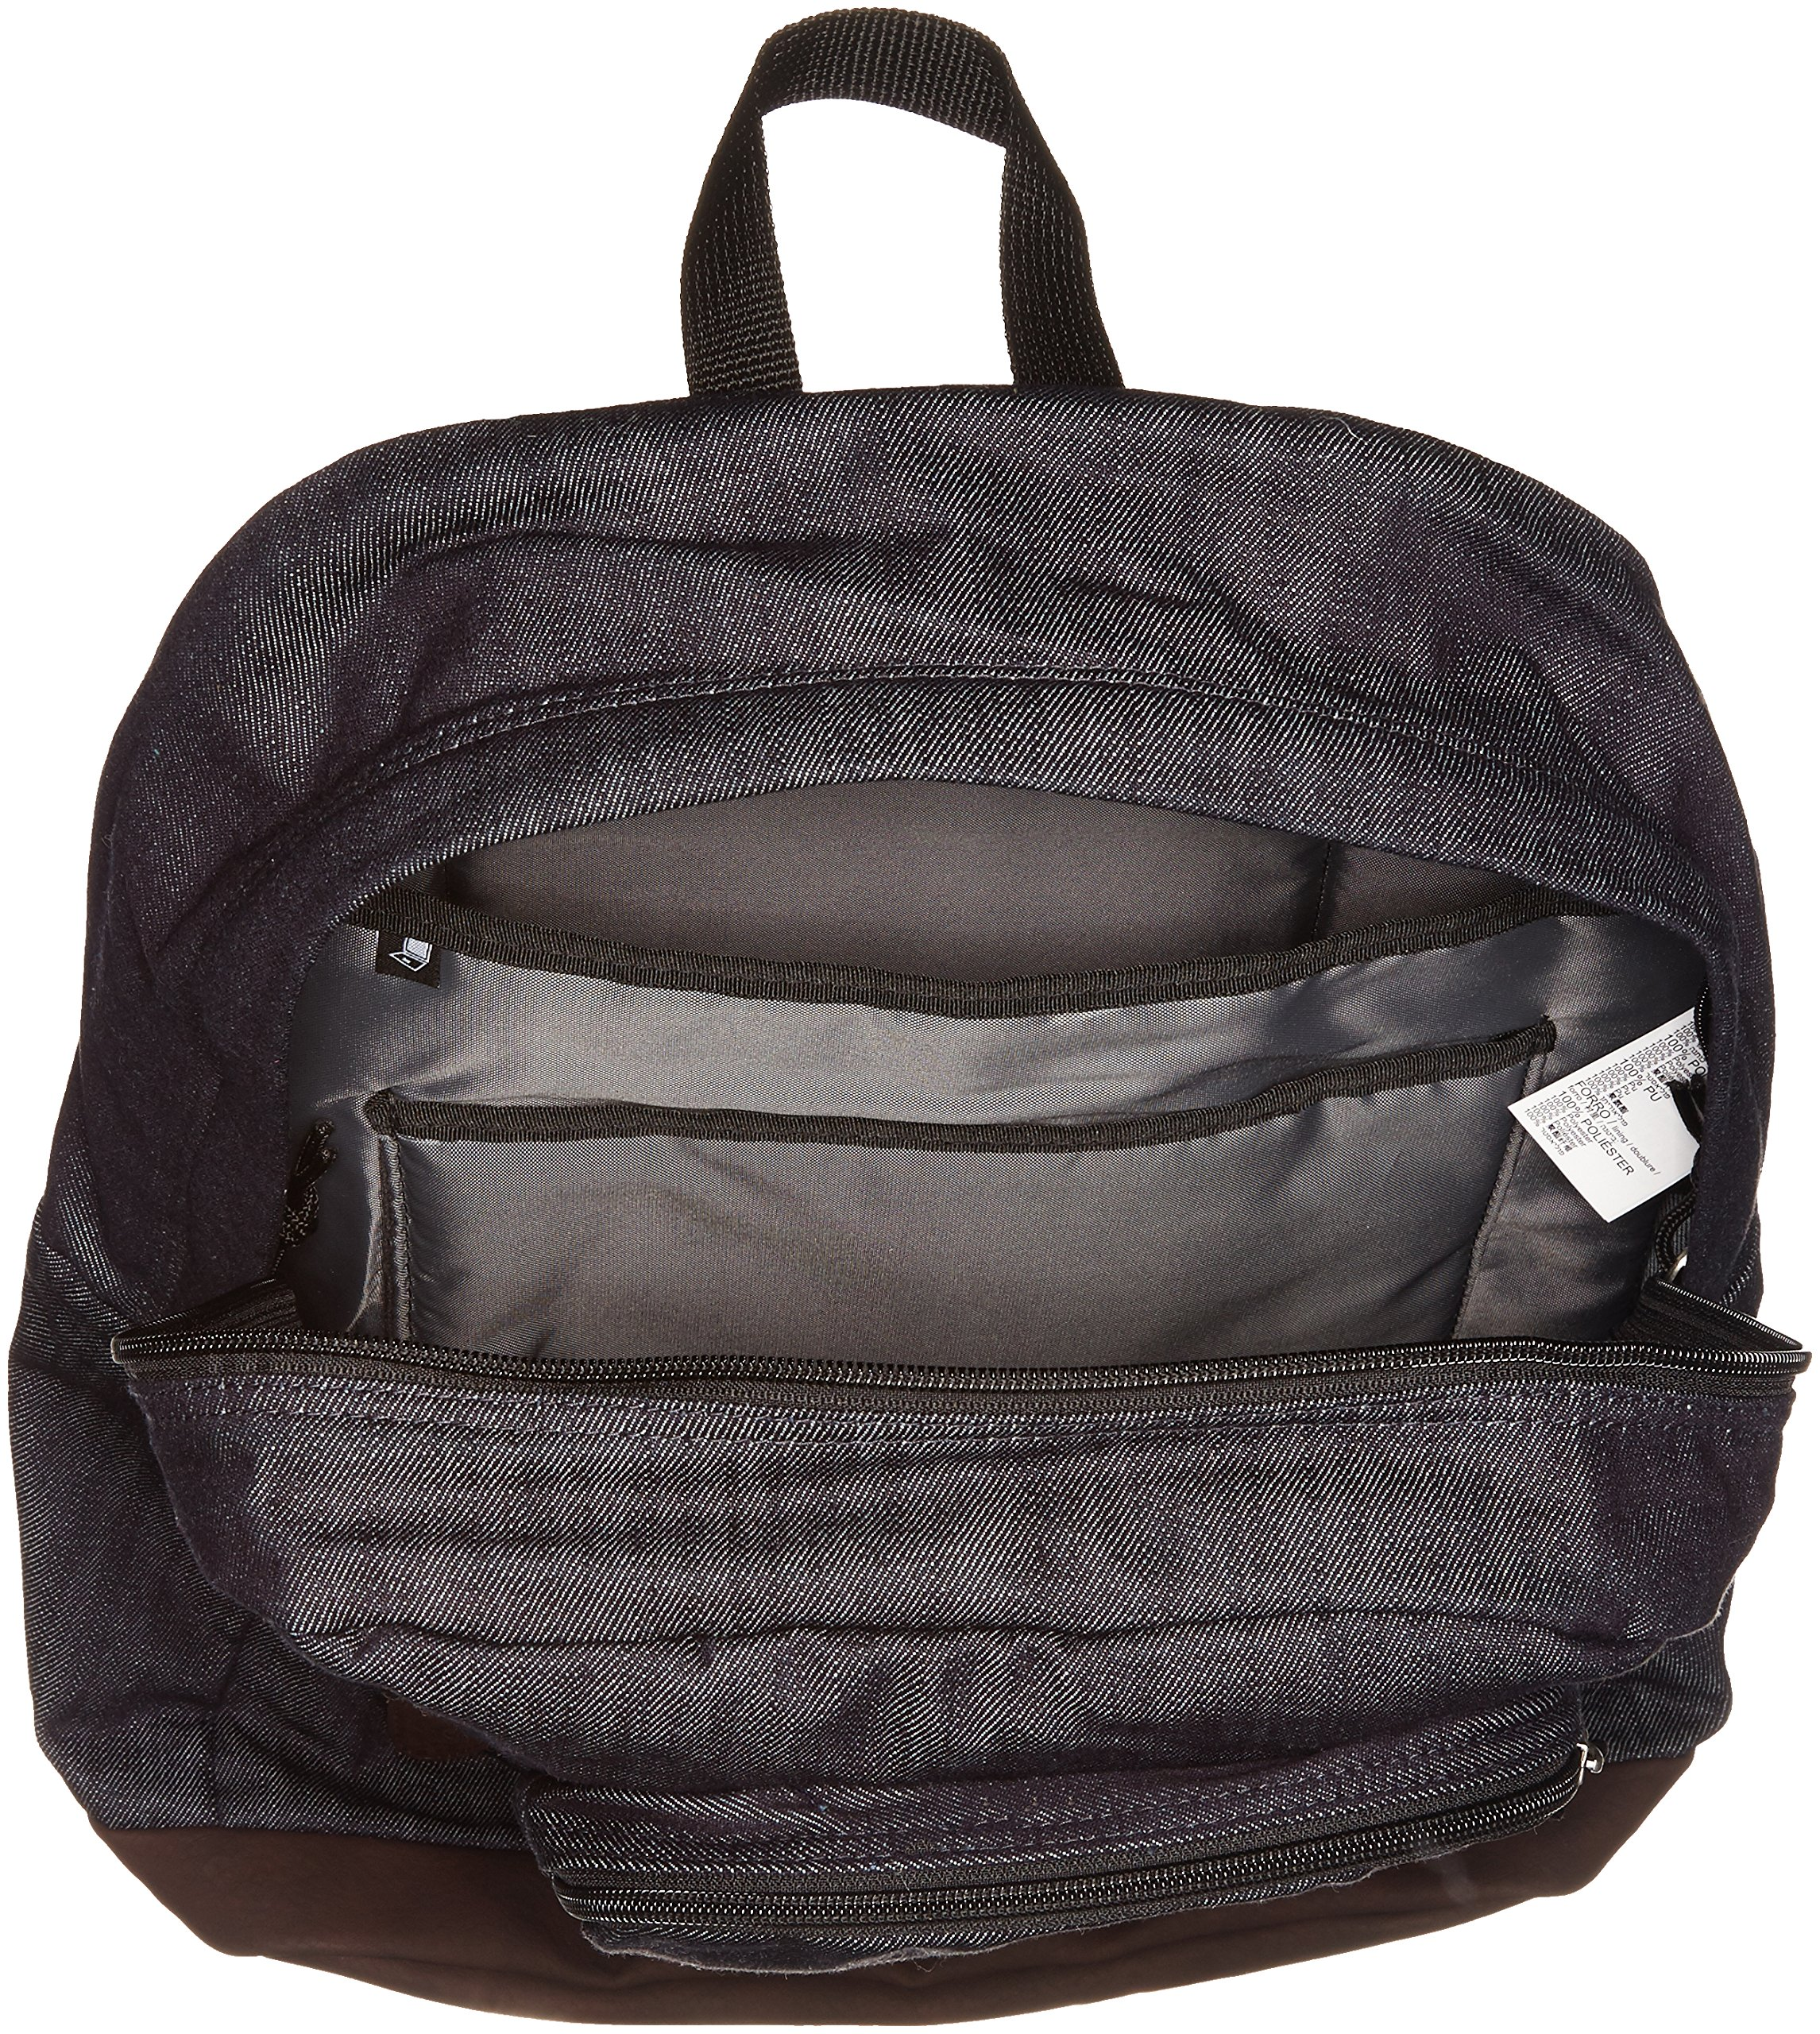 JanSport Houston Laptop Backpack- Discontinued Colors (Blue Denim - Expressions) by JanSport (Image #3)